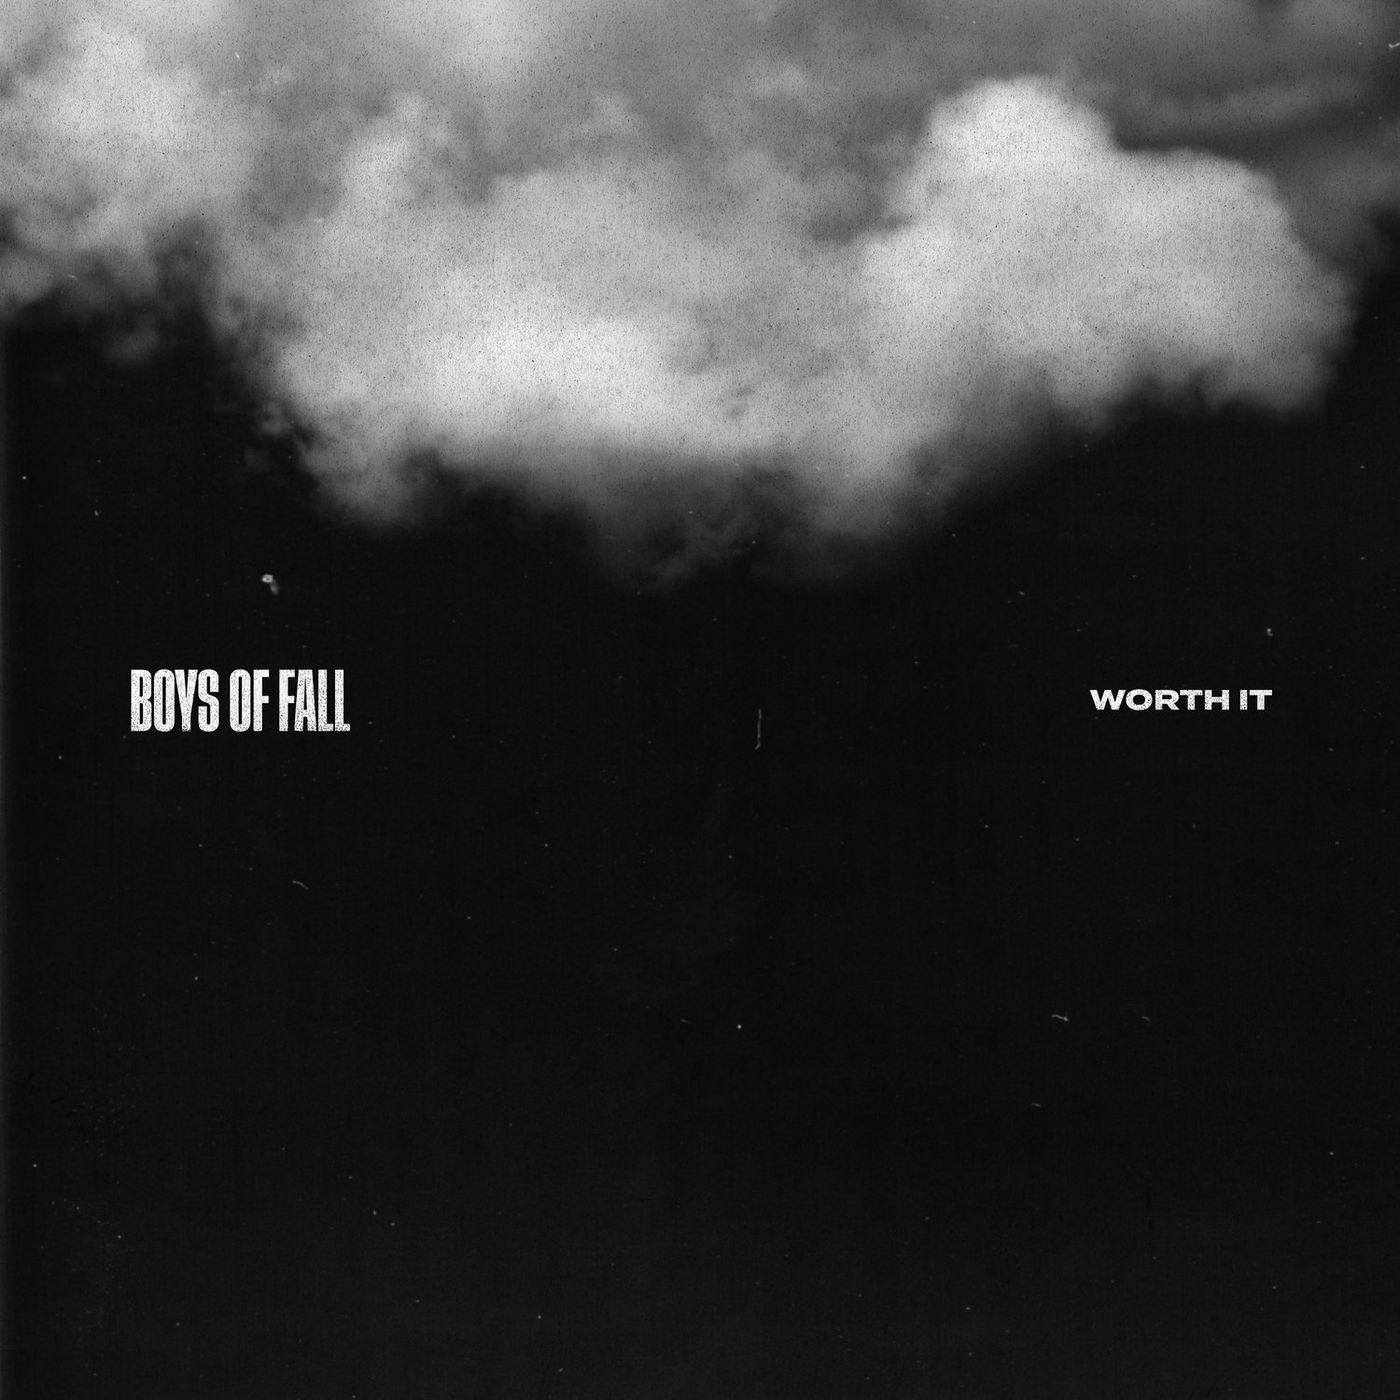 Boys of Fall - Worth It [single] (2020)